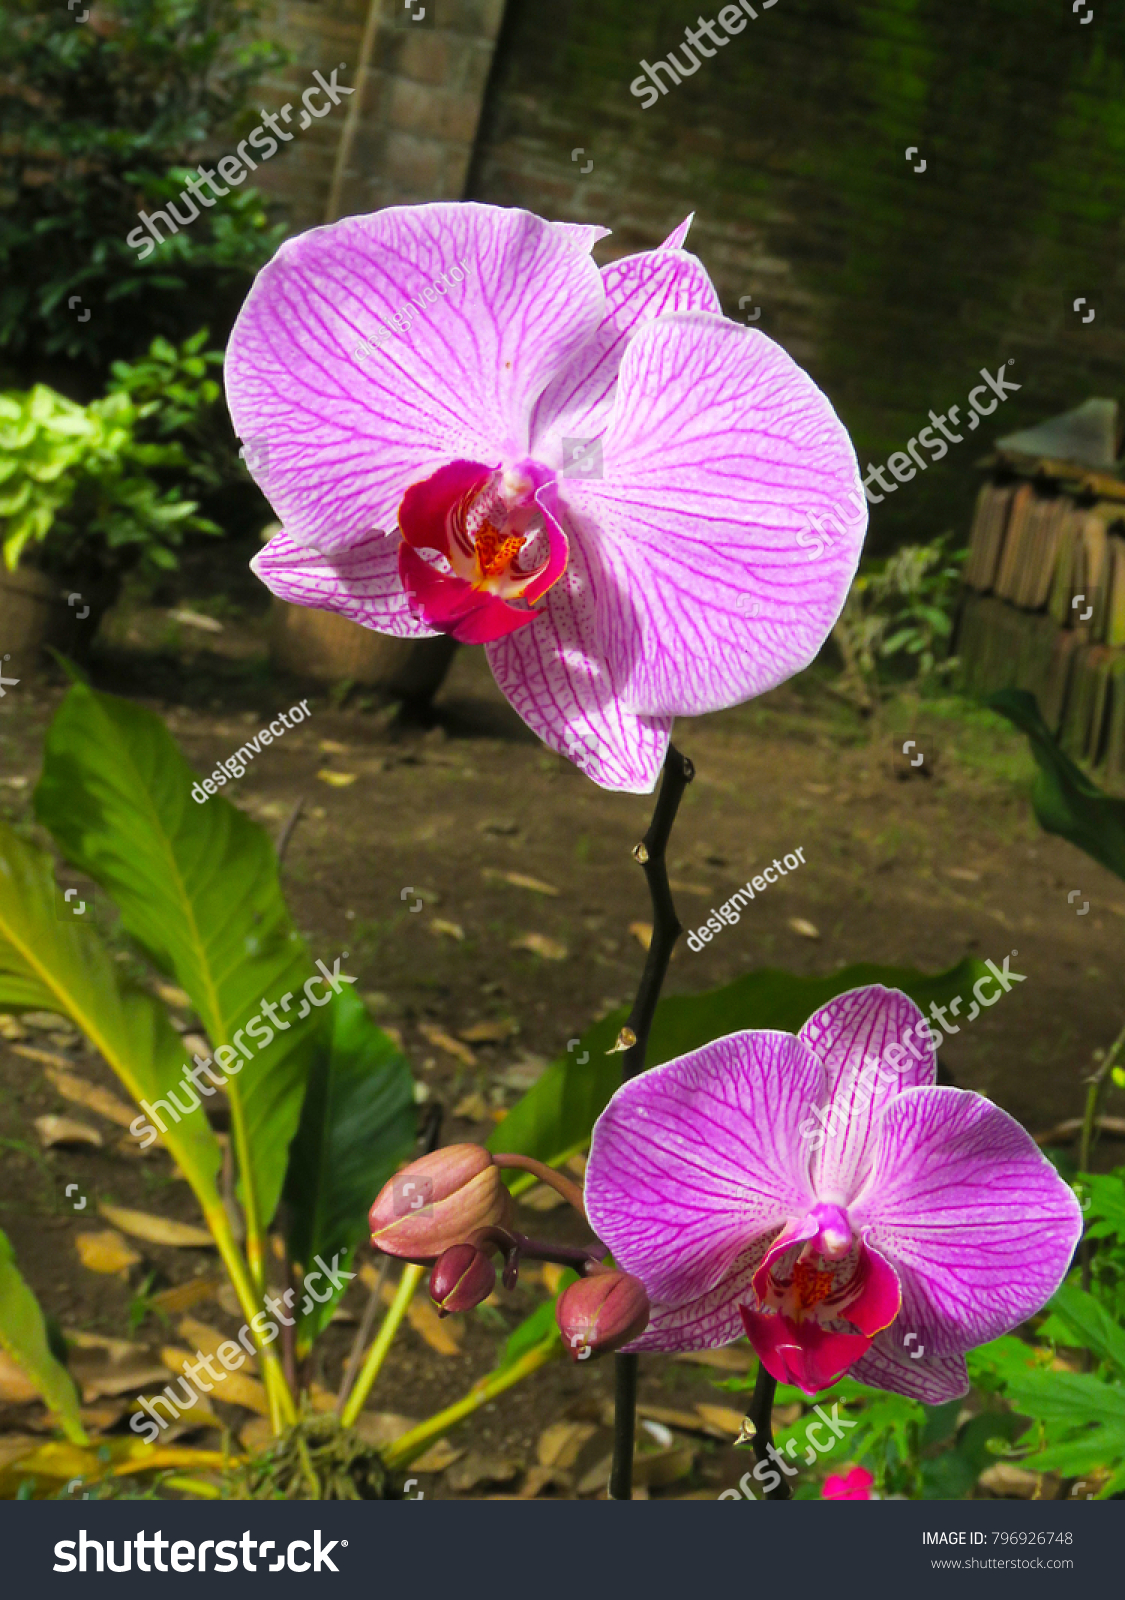 Jasmine flower purple beauty nature image stock photo edit now jasmine flower purple beauty nature image izmirmasajfo